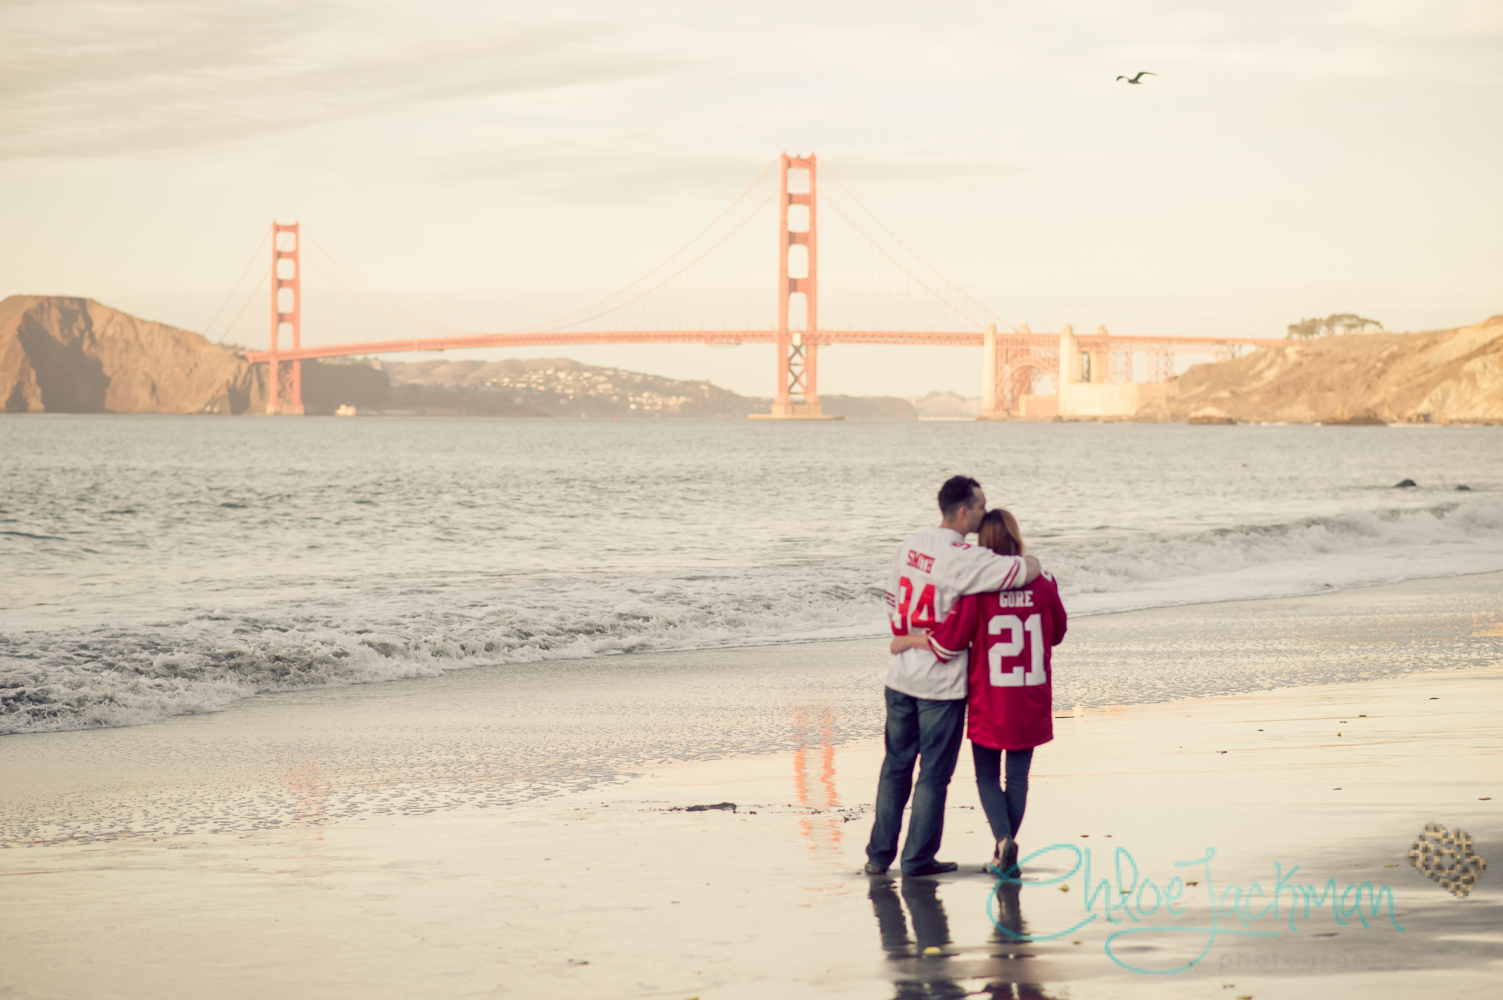 Chloe-Jackman-Photography-Golden-Gate-Park-Engagement-Session-2014-271